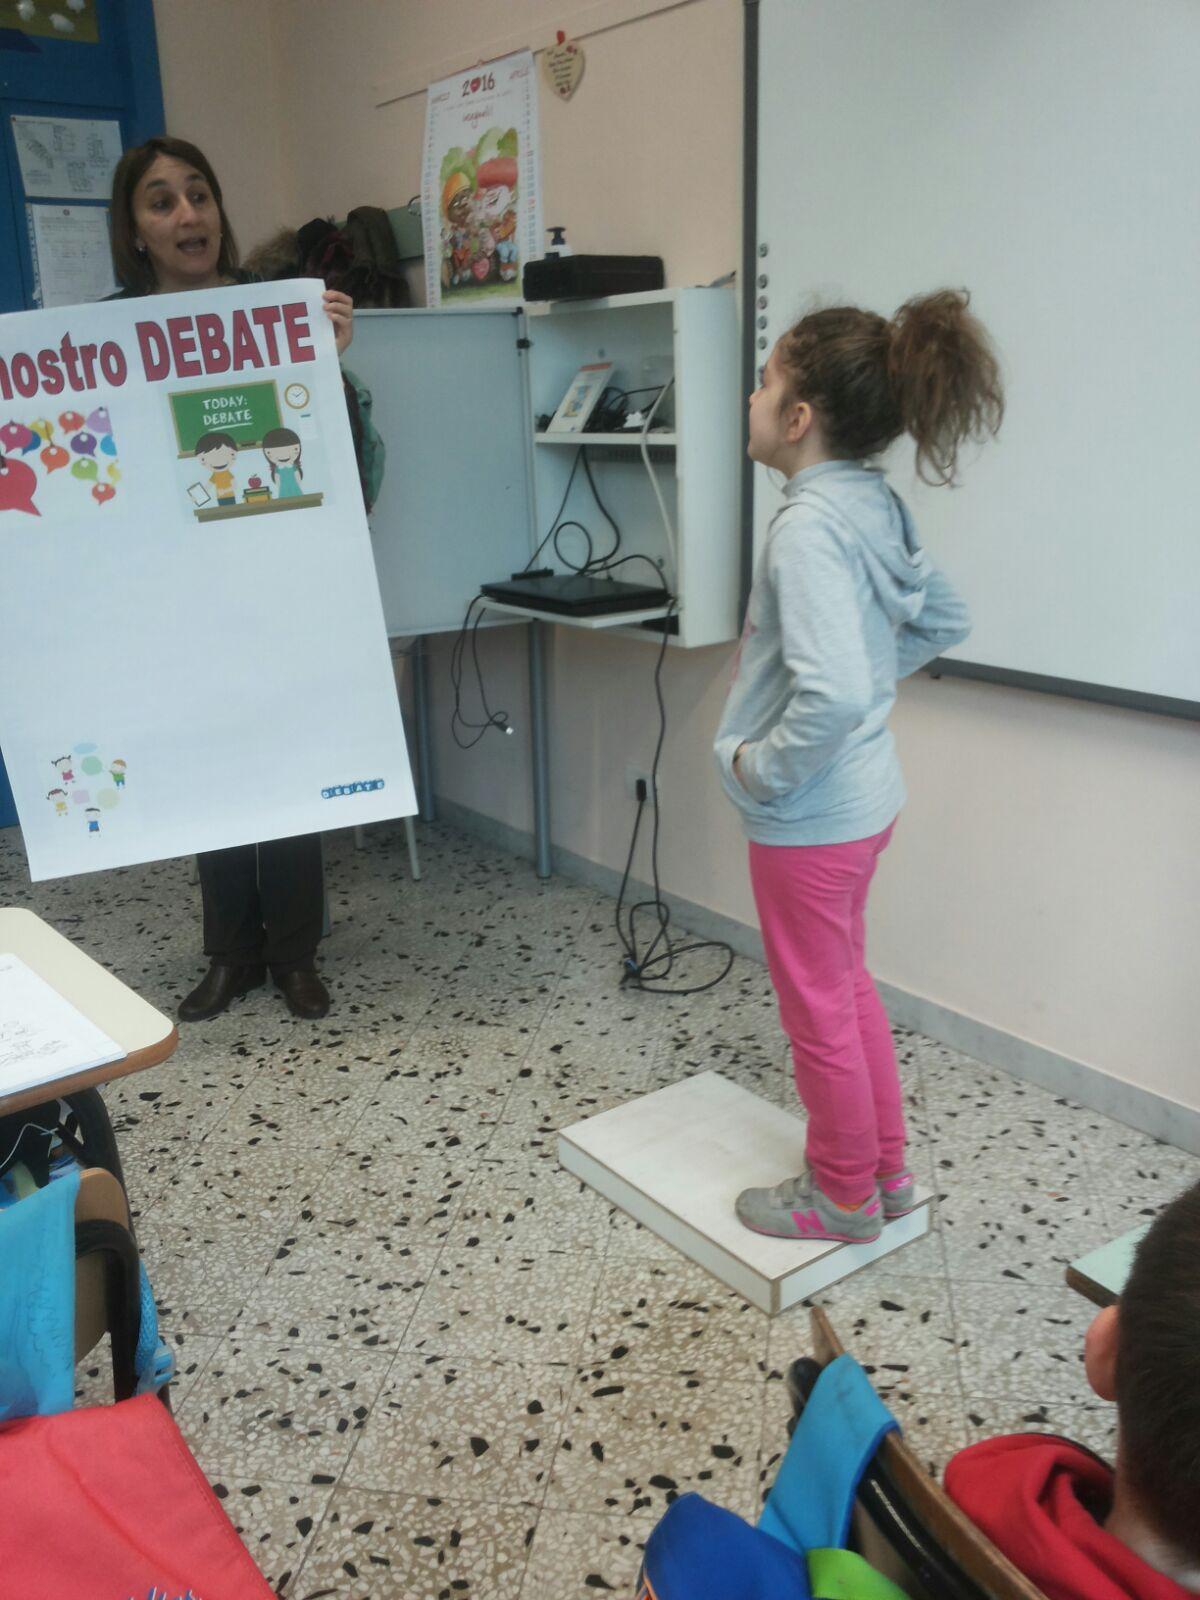 Santeramo_Cooperative Debate e Flipped Classroom